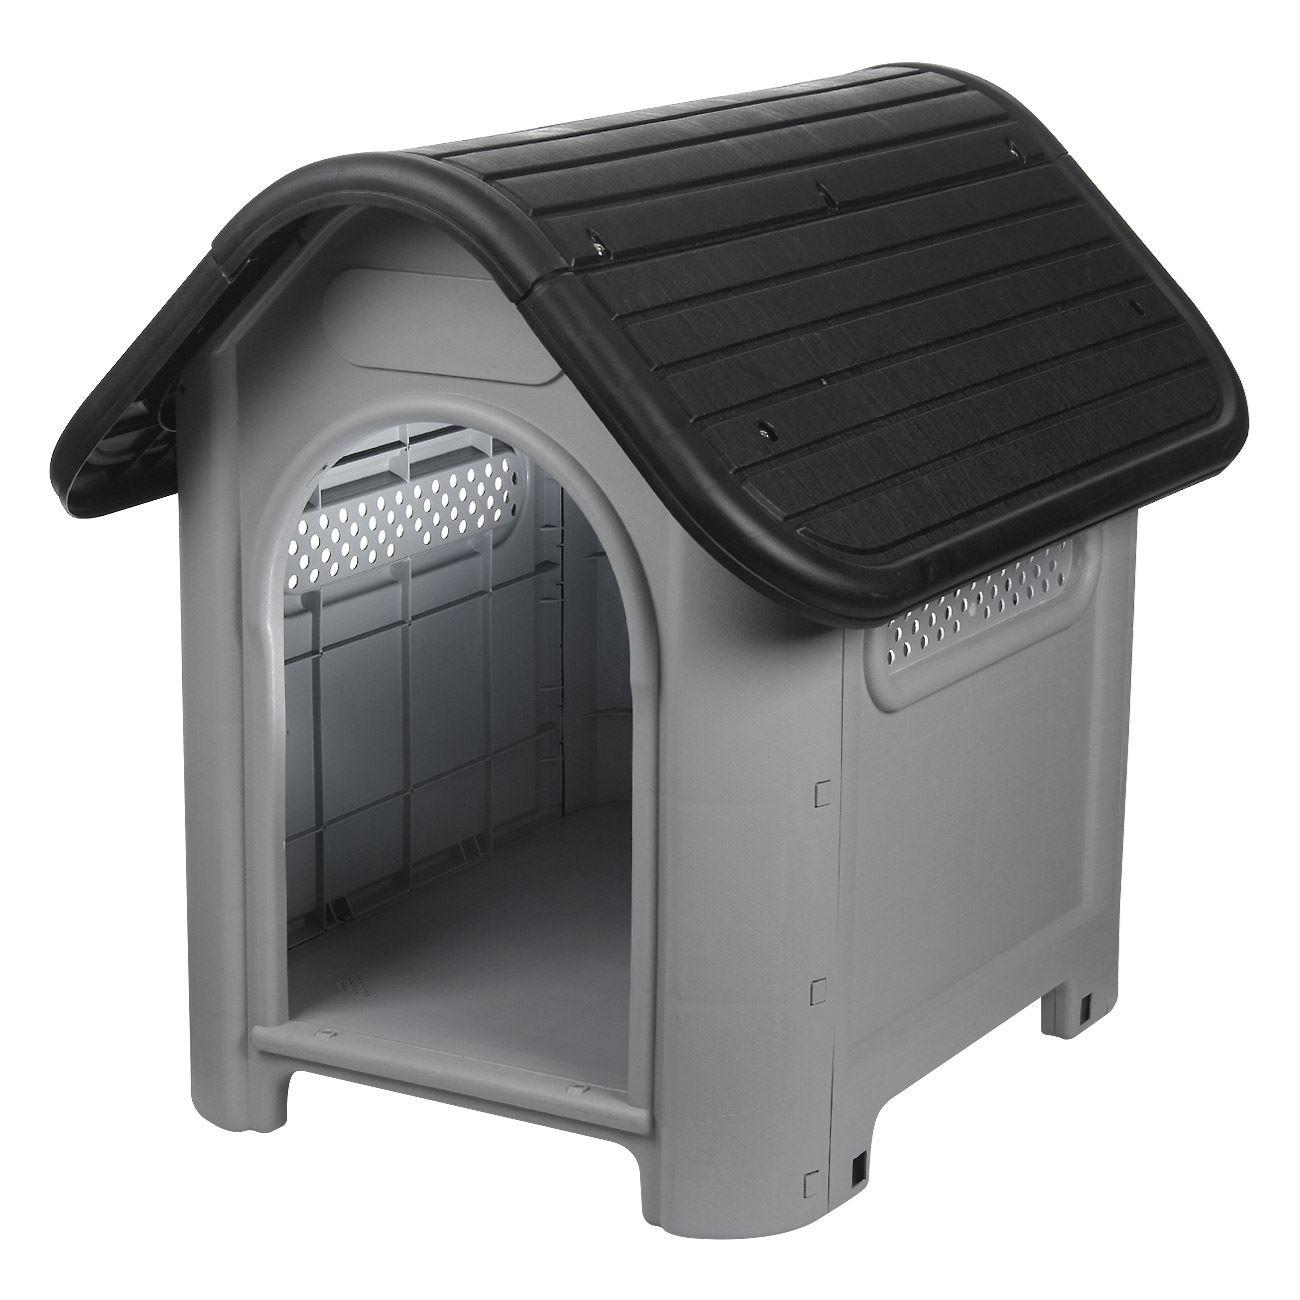 94ab16342644 Σπίτι Σκύλου Γκρι Μαύρο 75x59x66 cm   Σπίτια Σκύλου